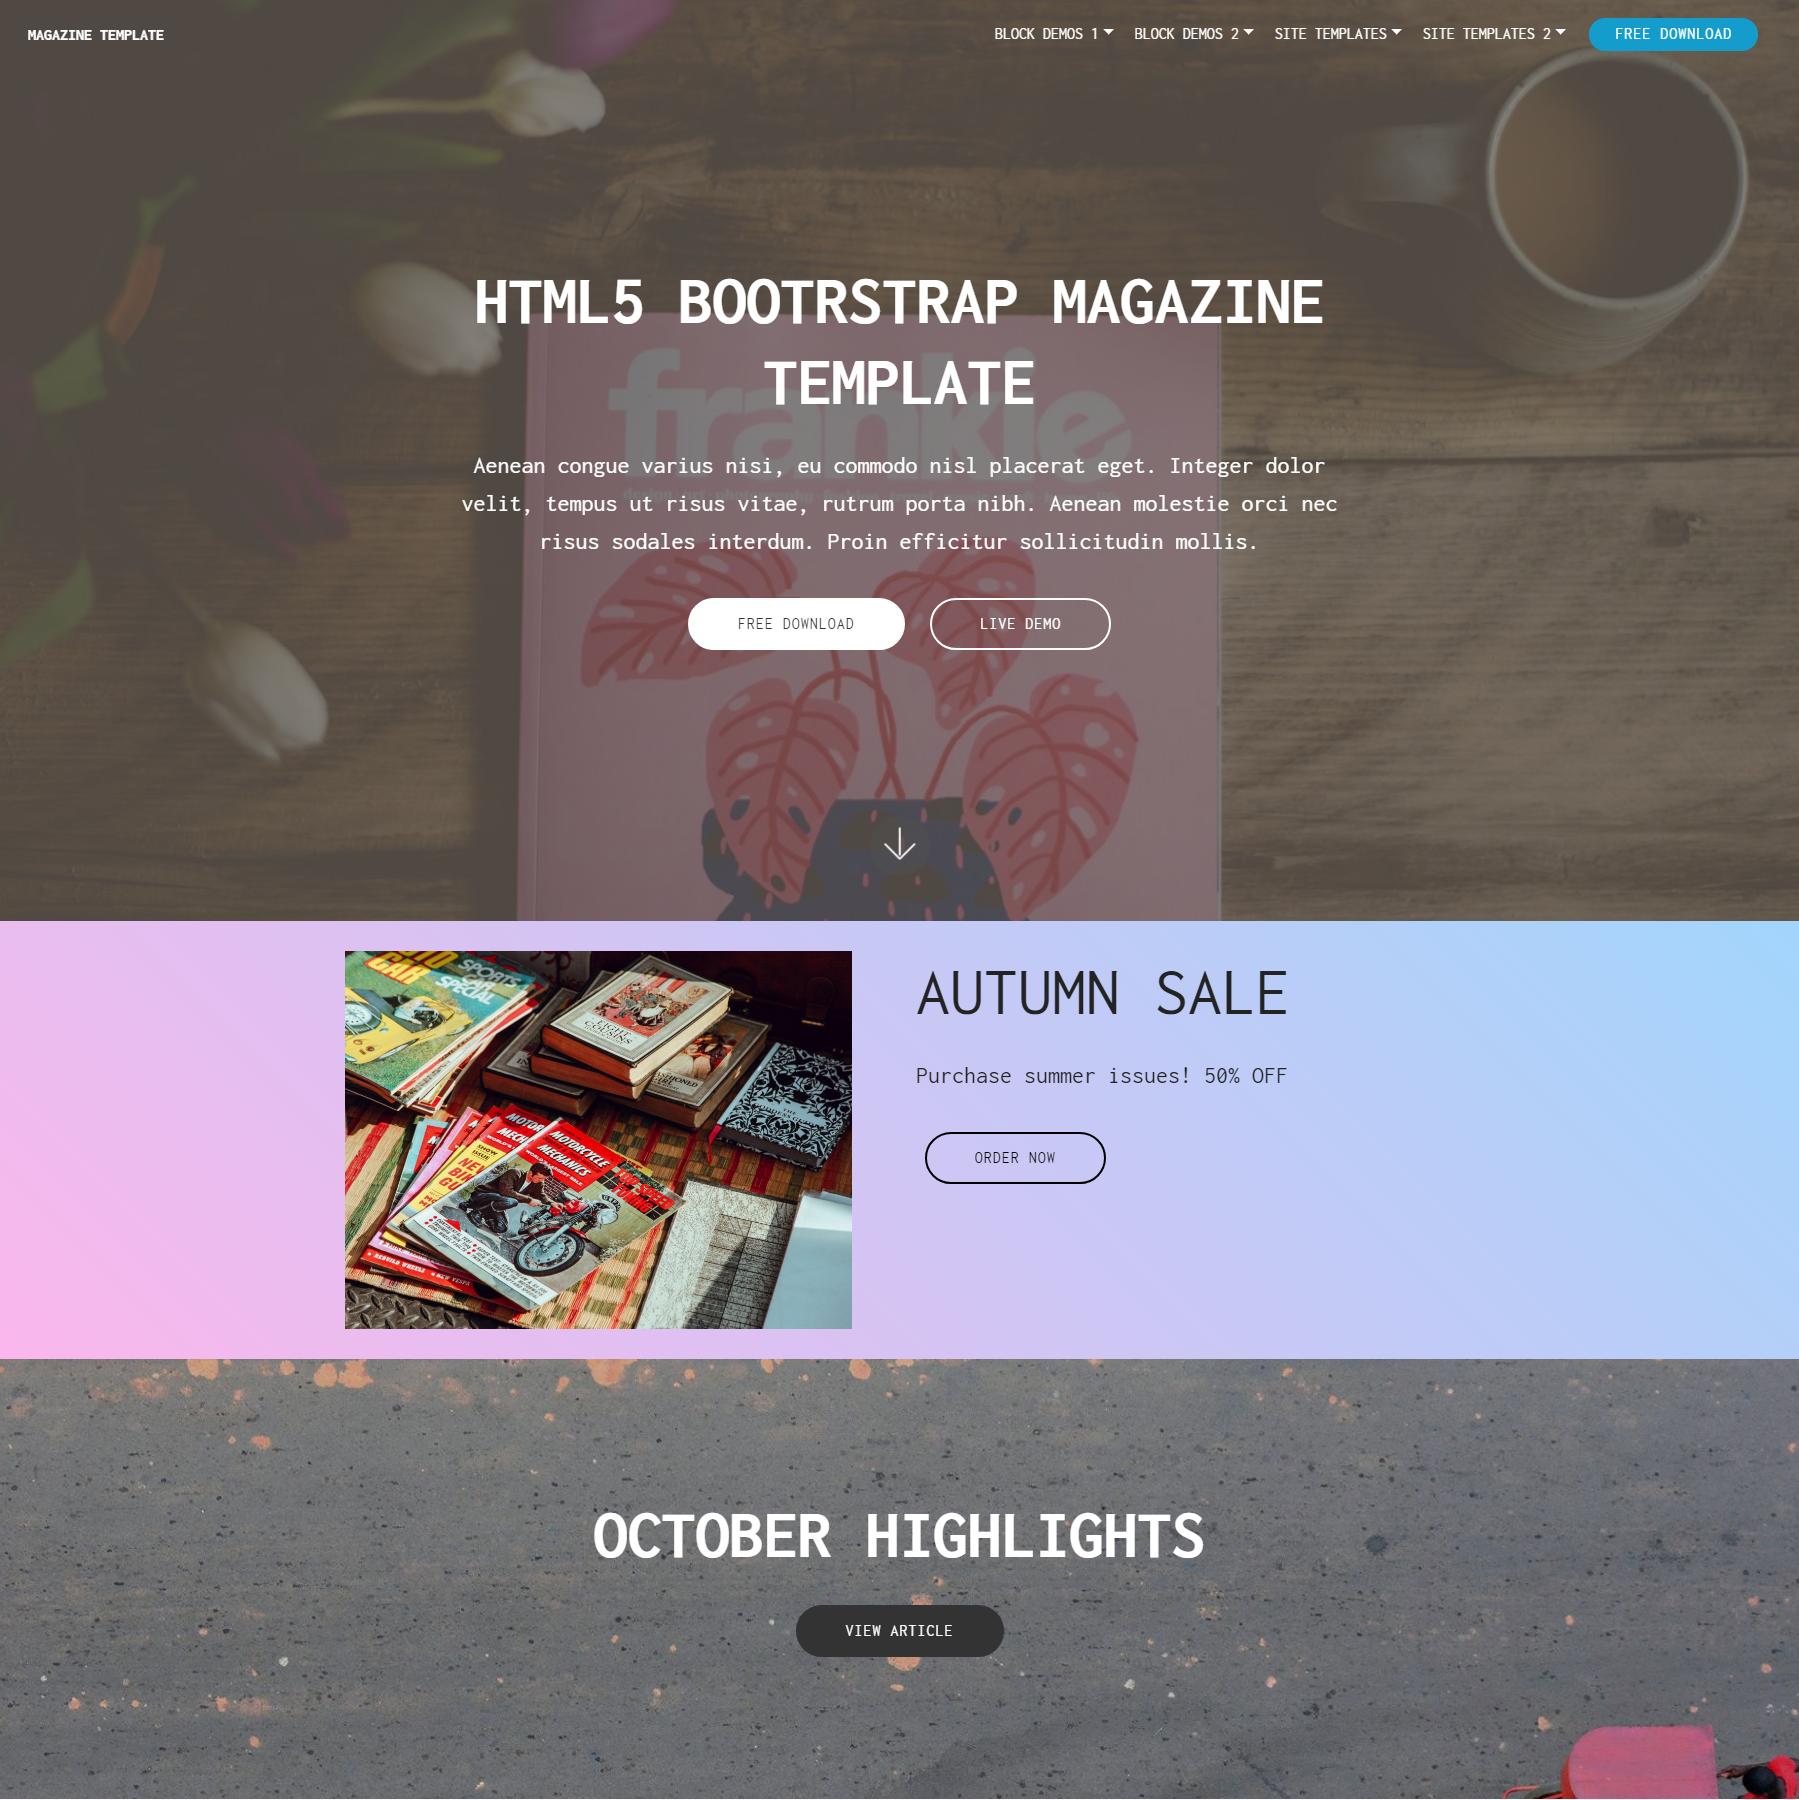 HTML5 Bootstrap Magazine Templates